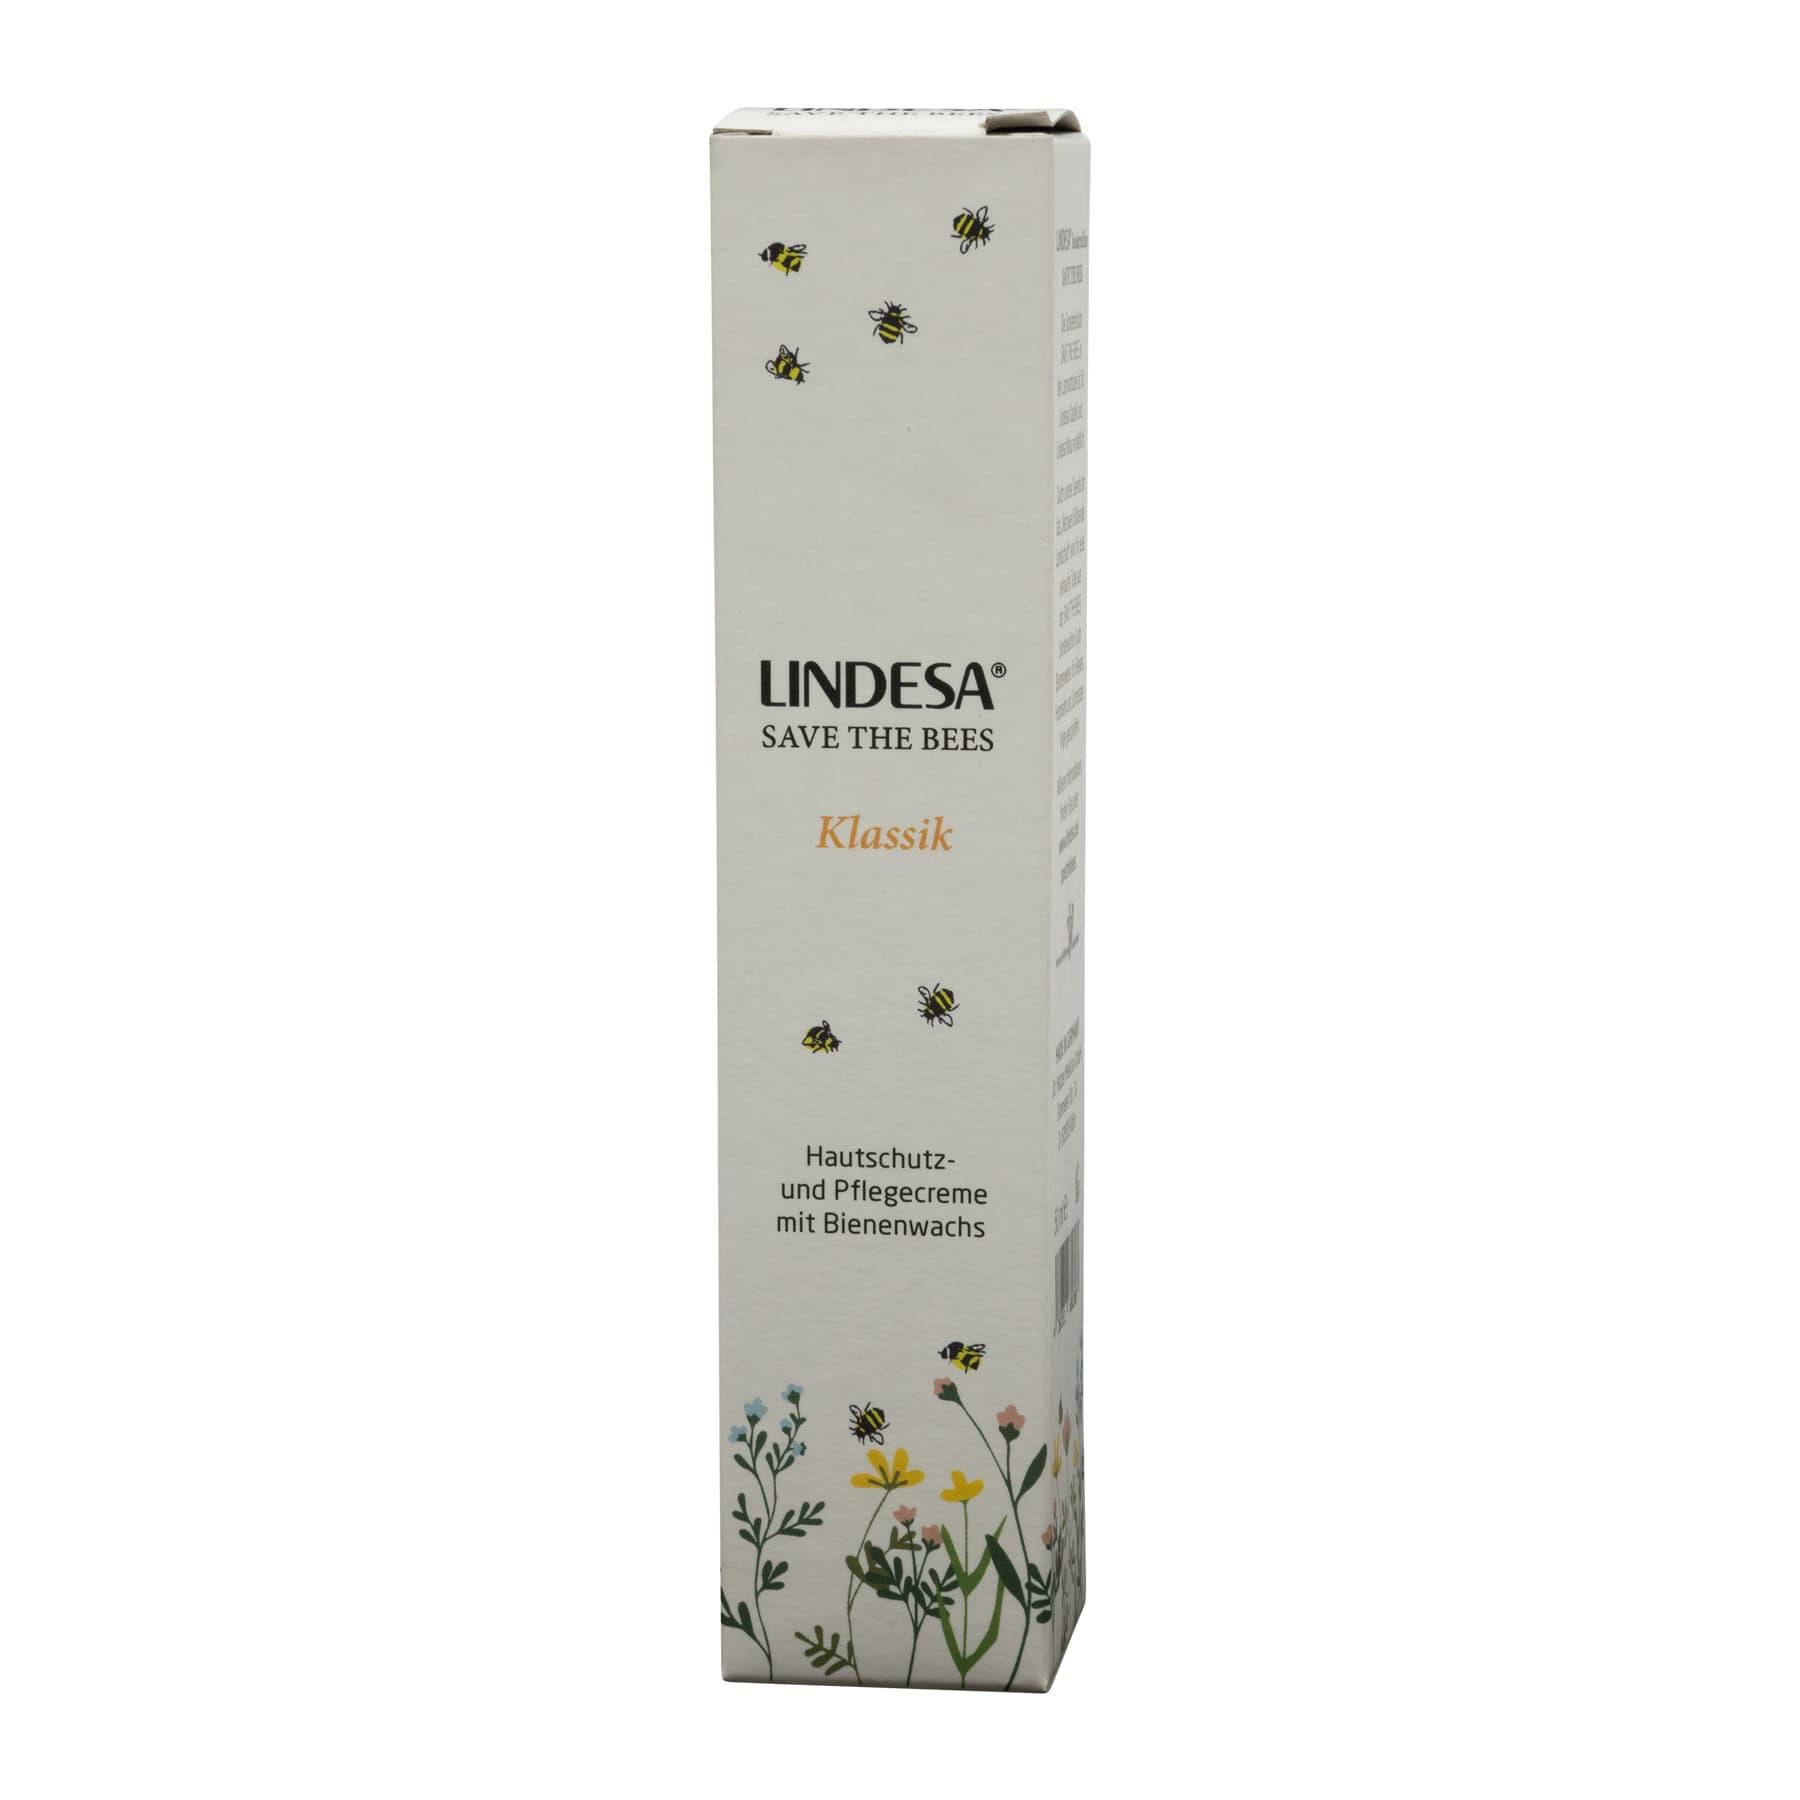 Lindesa SAVE THE BEES, Klassik, Hautcreme 50 ml,